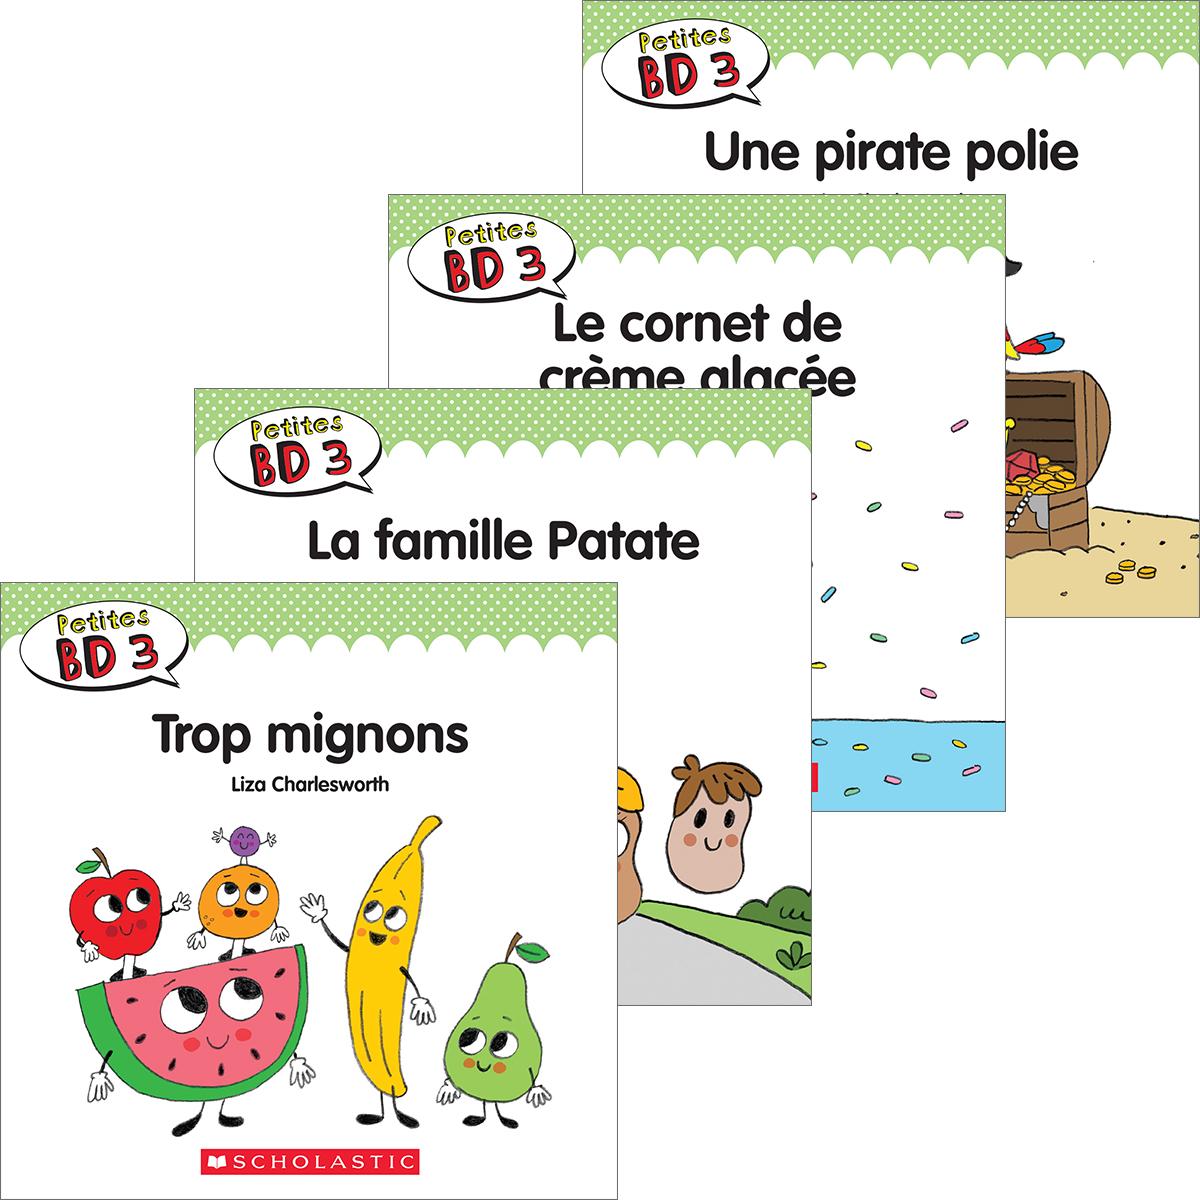 Petites BD Serie 3